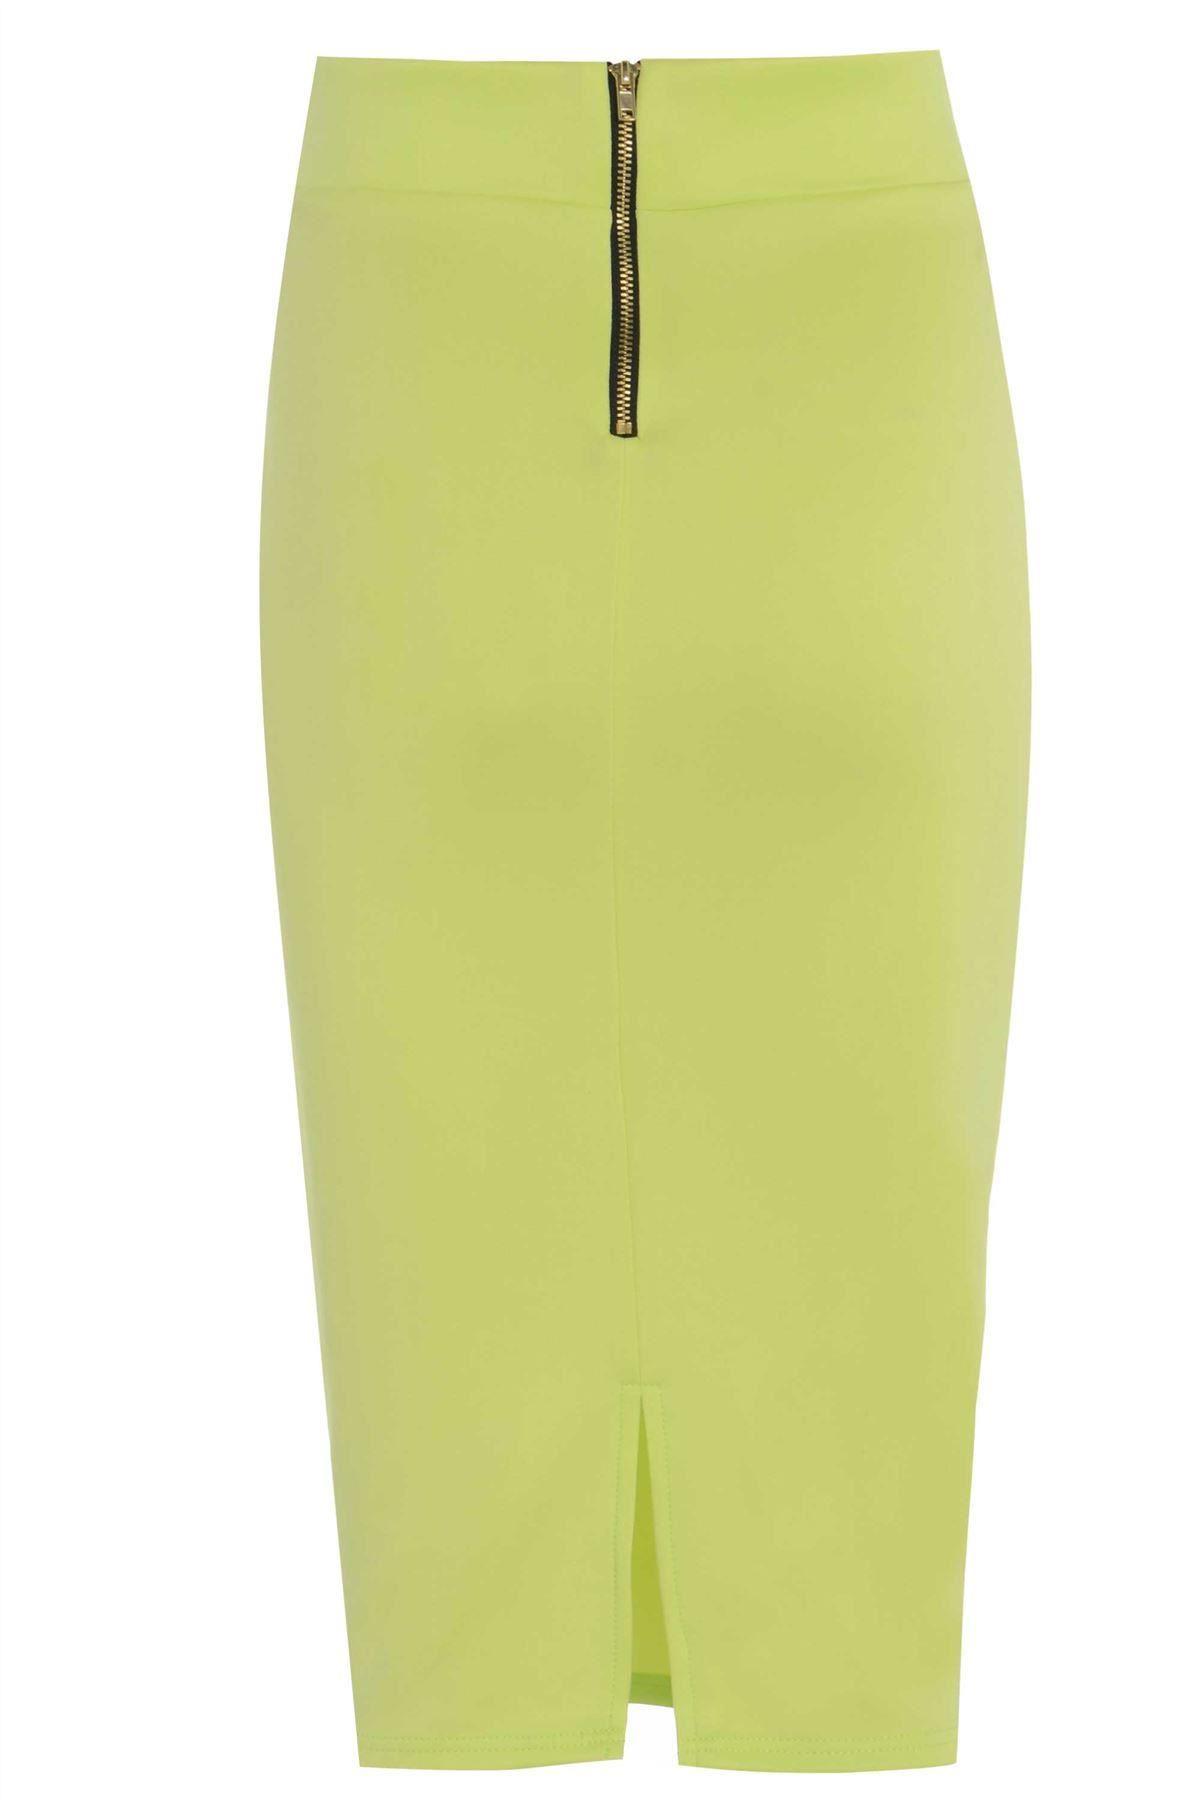 love2dress s casual lime pencil skirt ebay